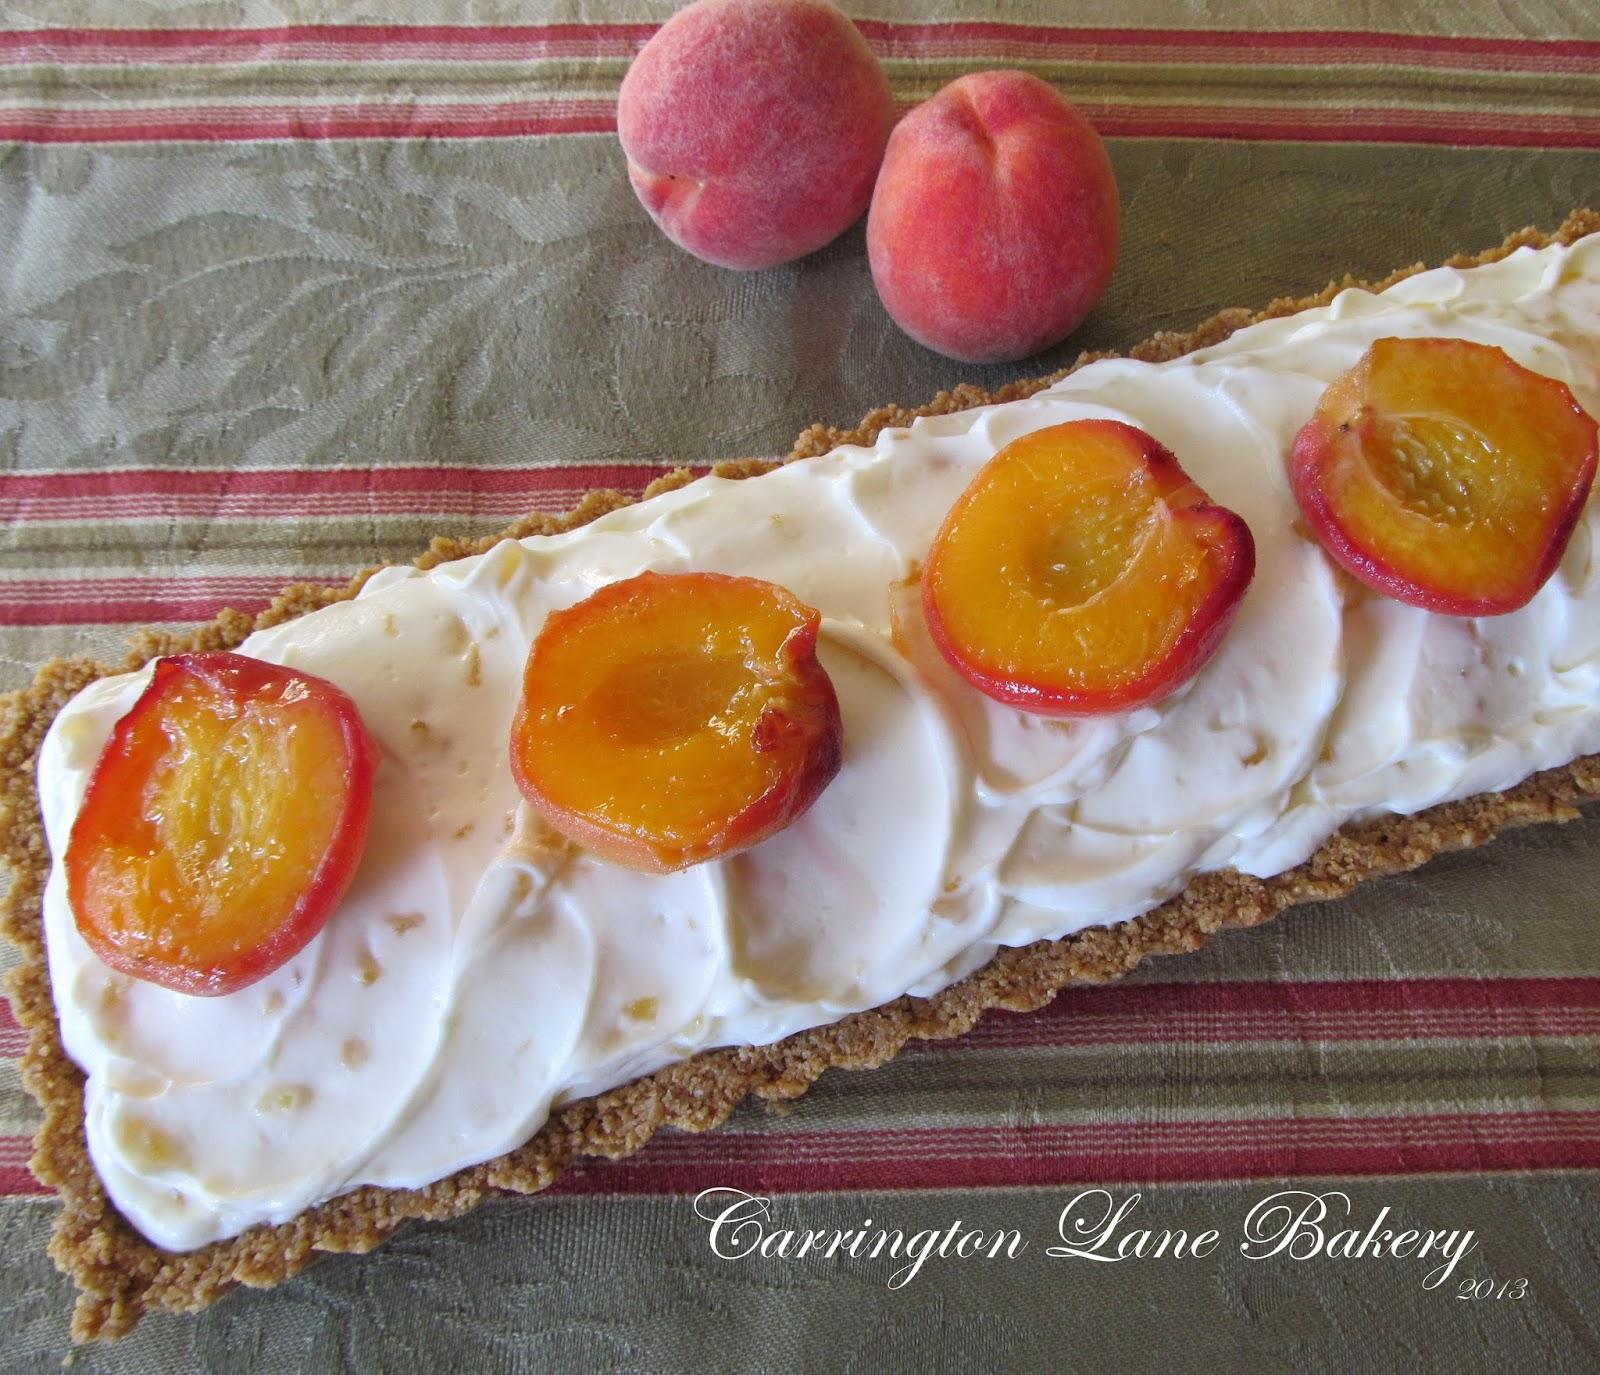 Carrington Lane Bakery: Mascarpone and Peach Tart